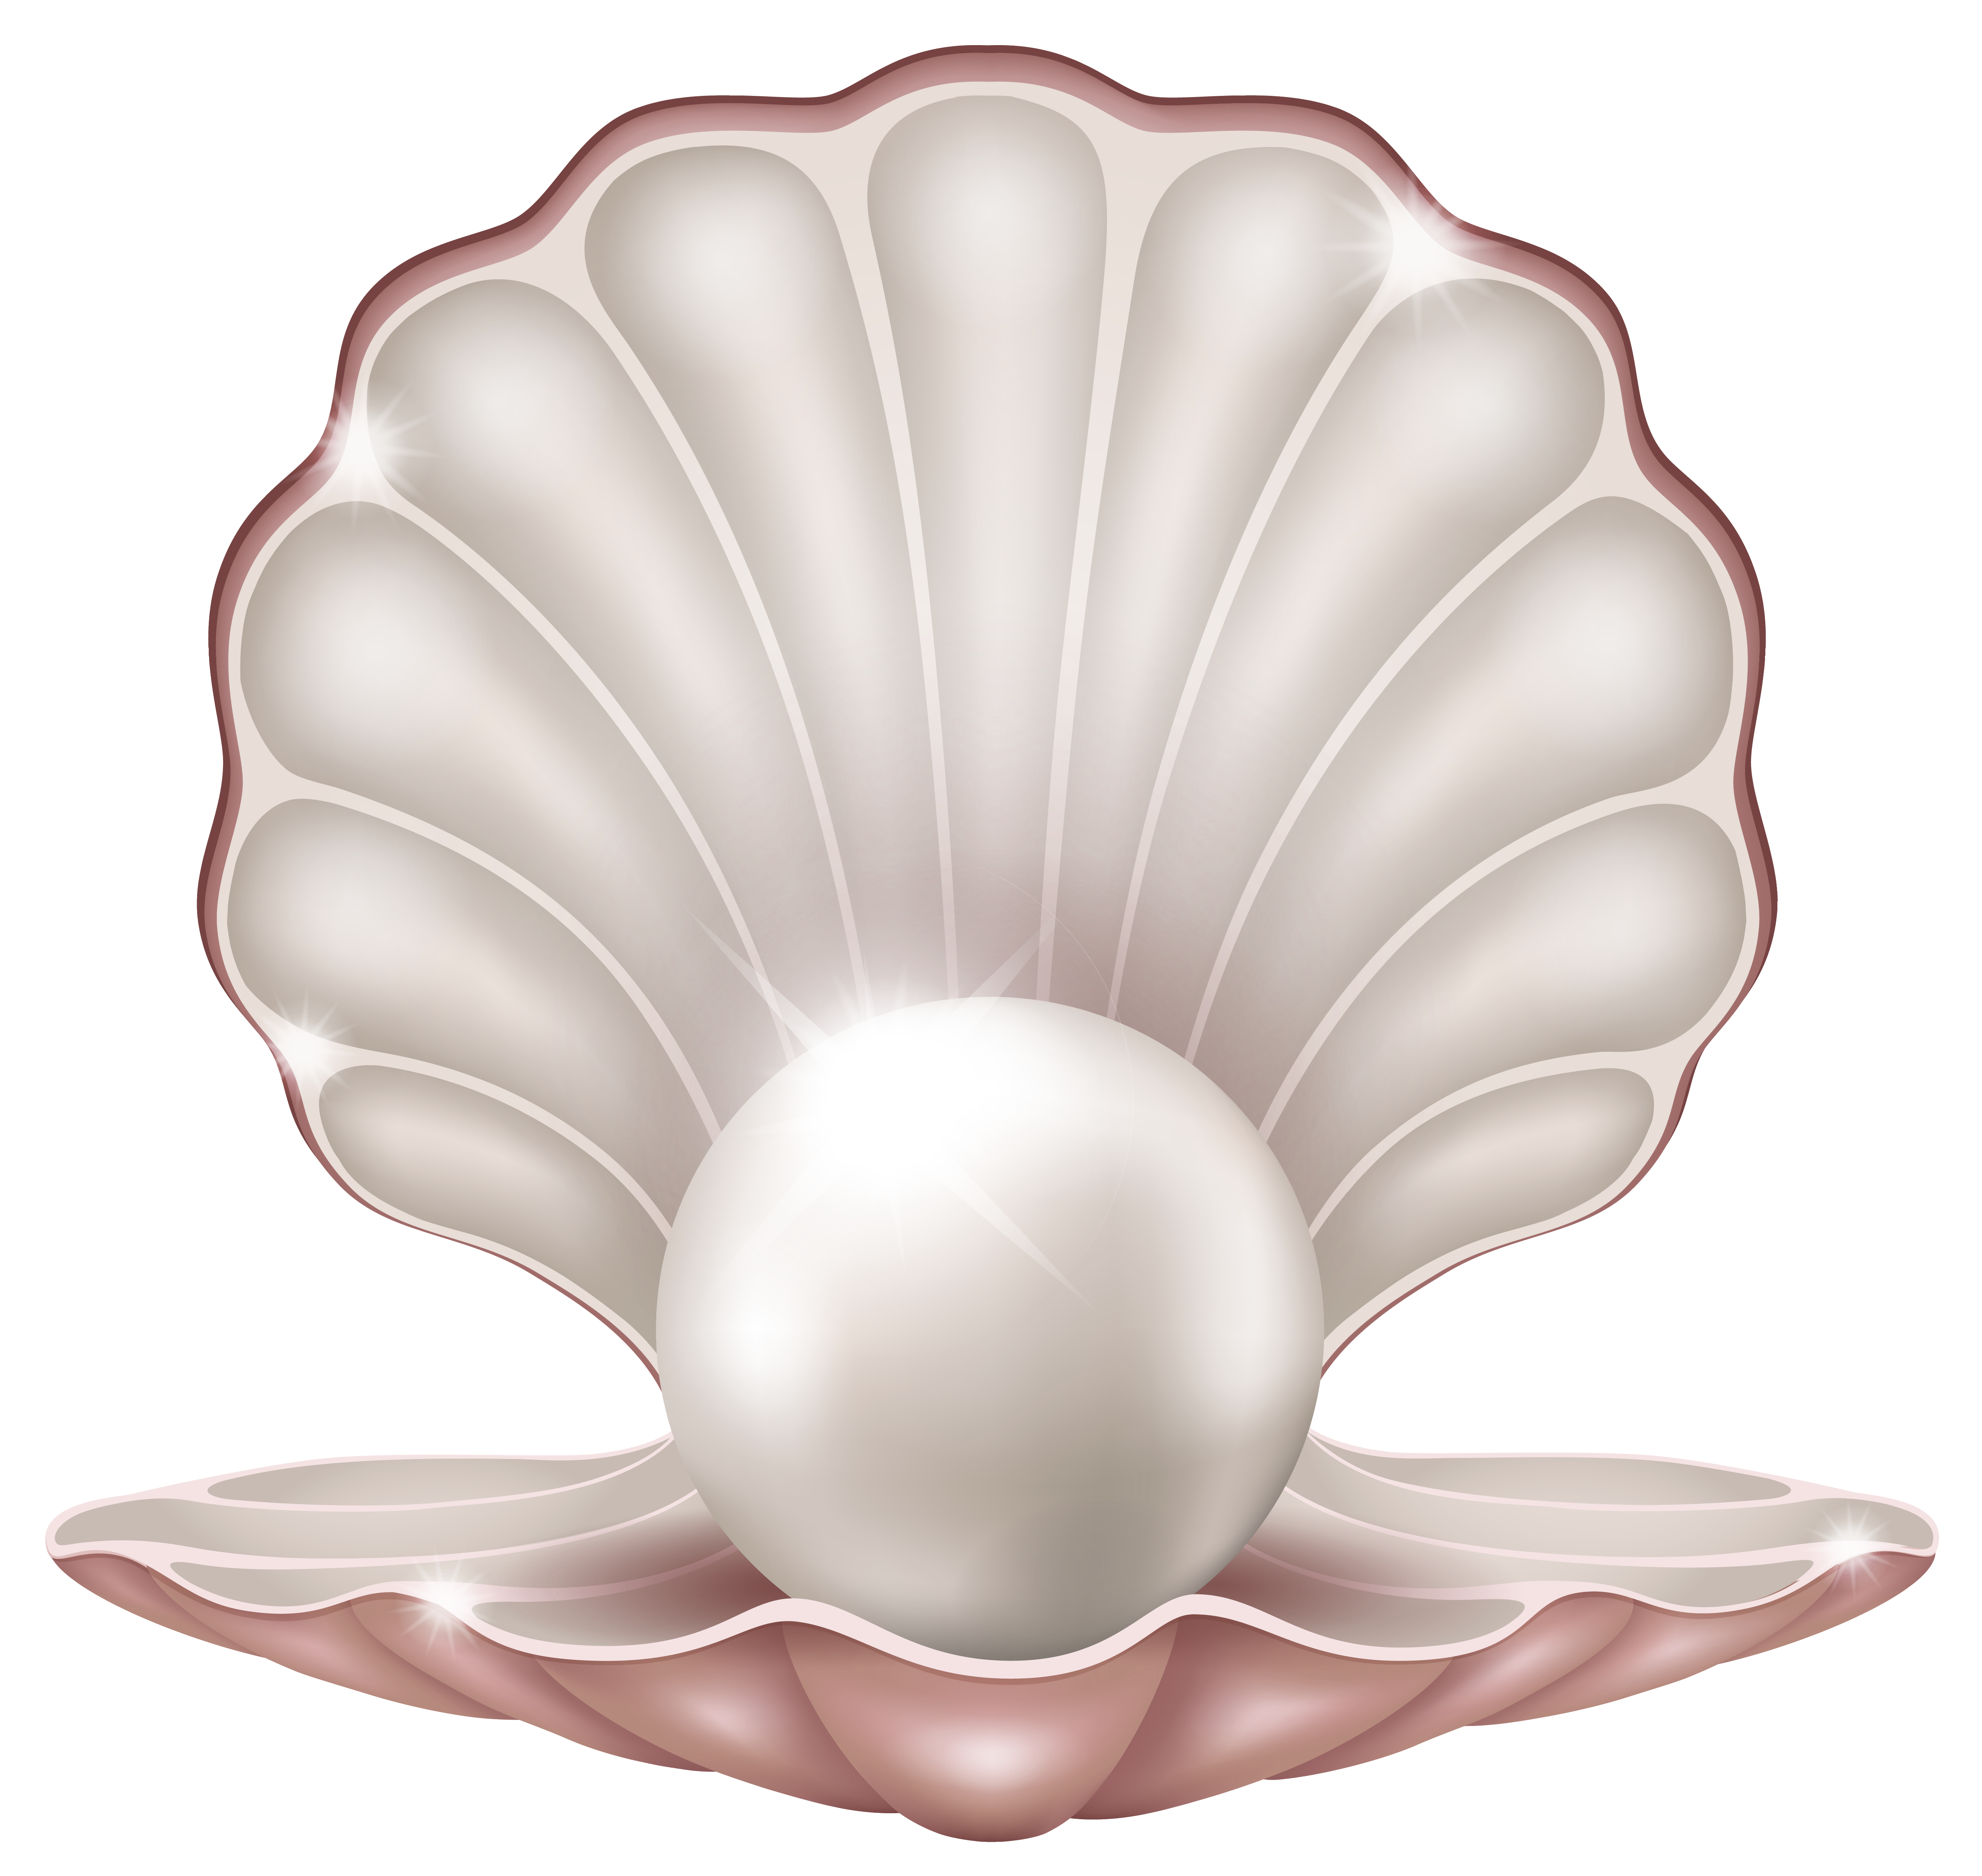 Clam Pearl Seashell Clip art.